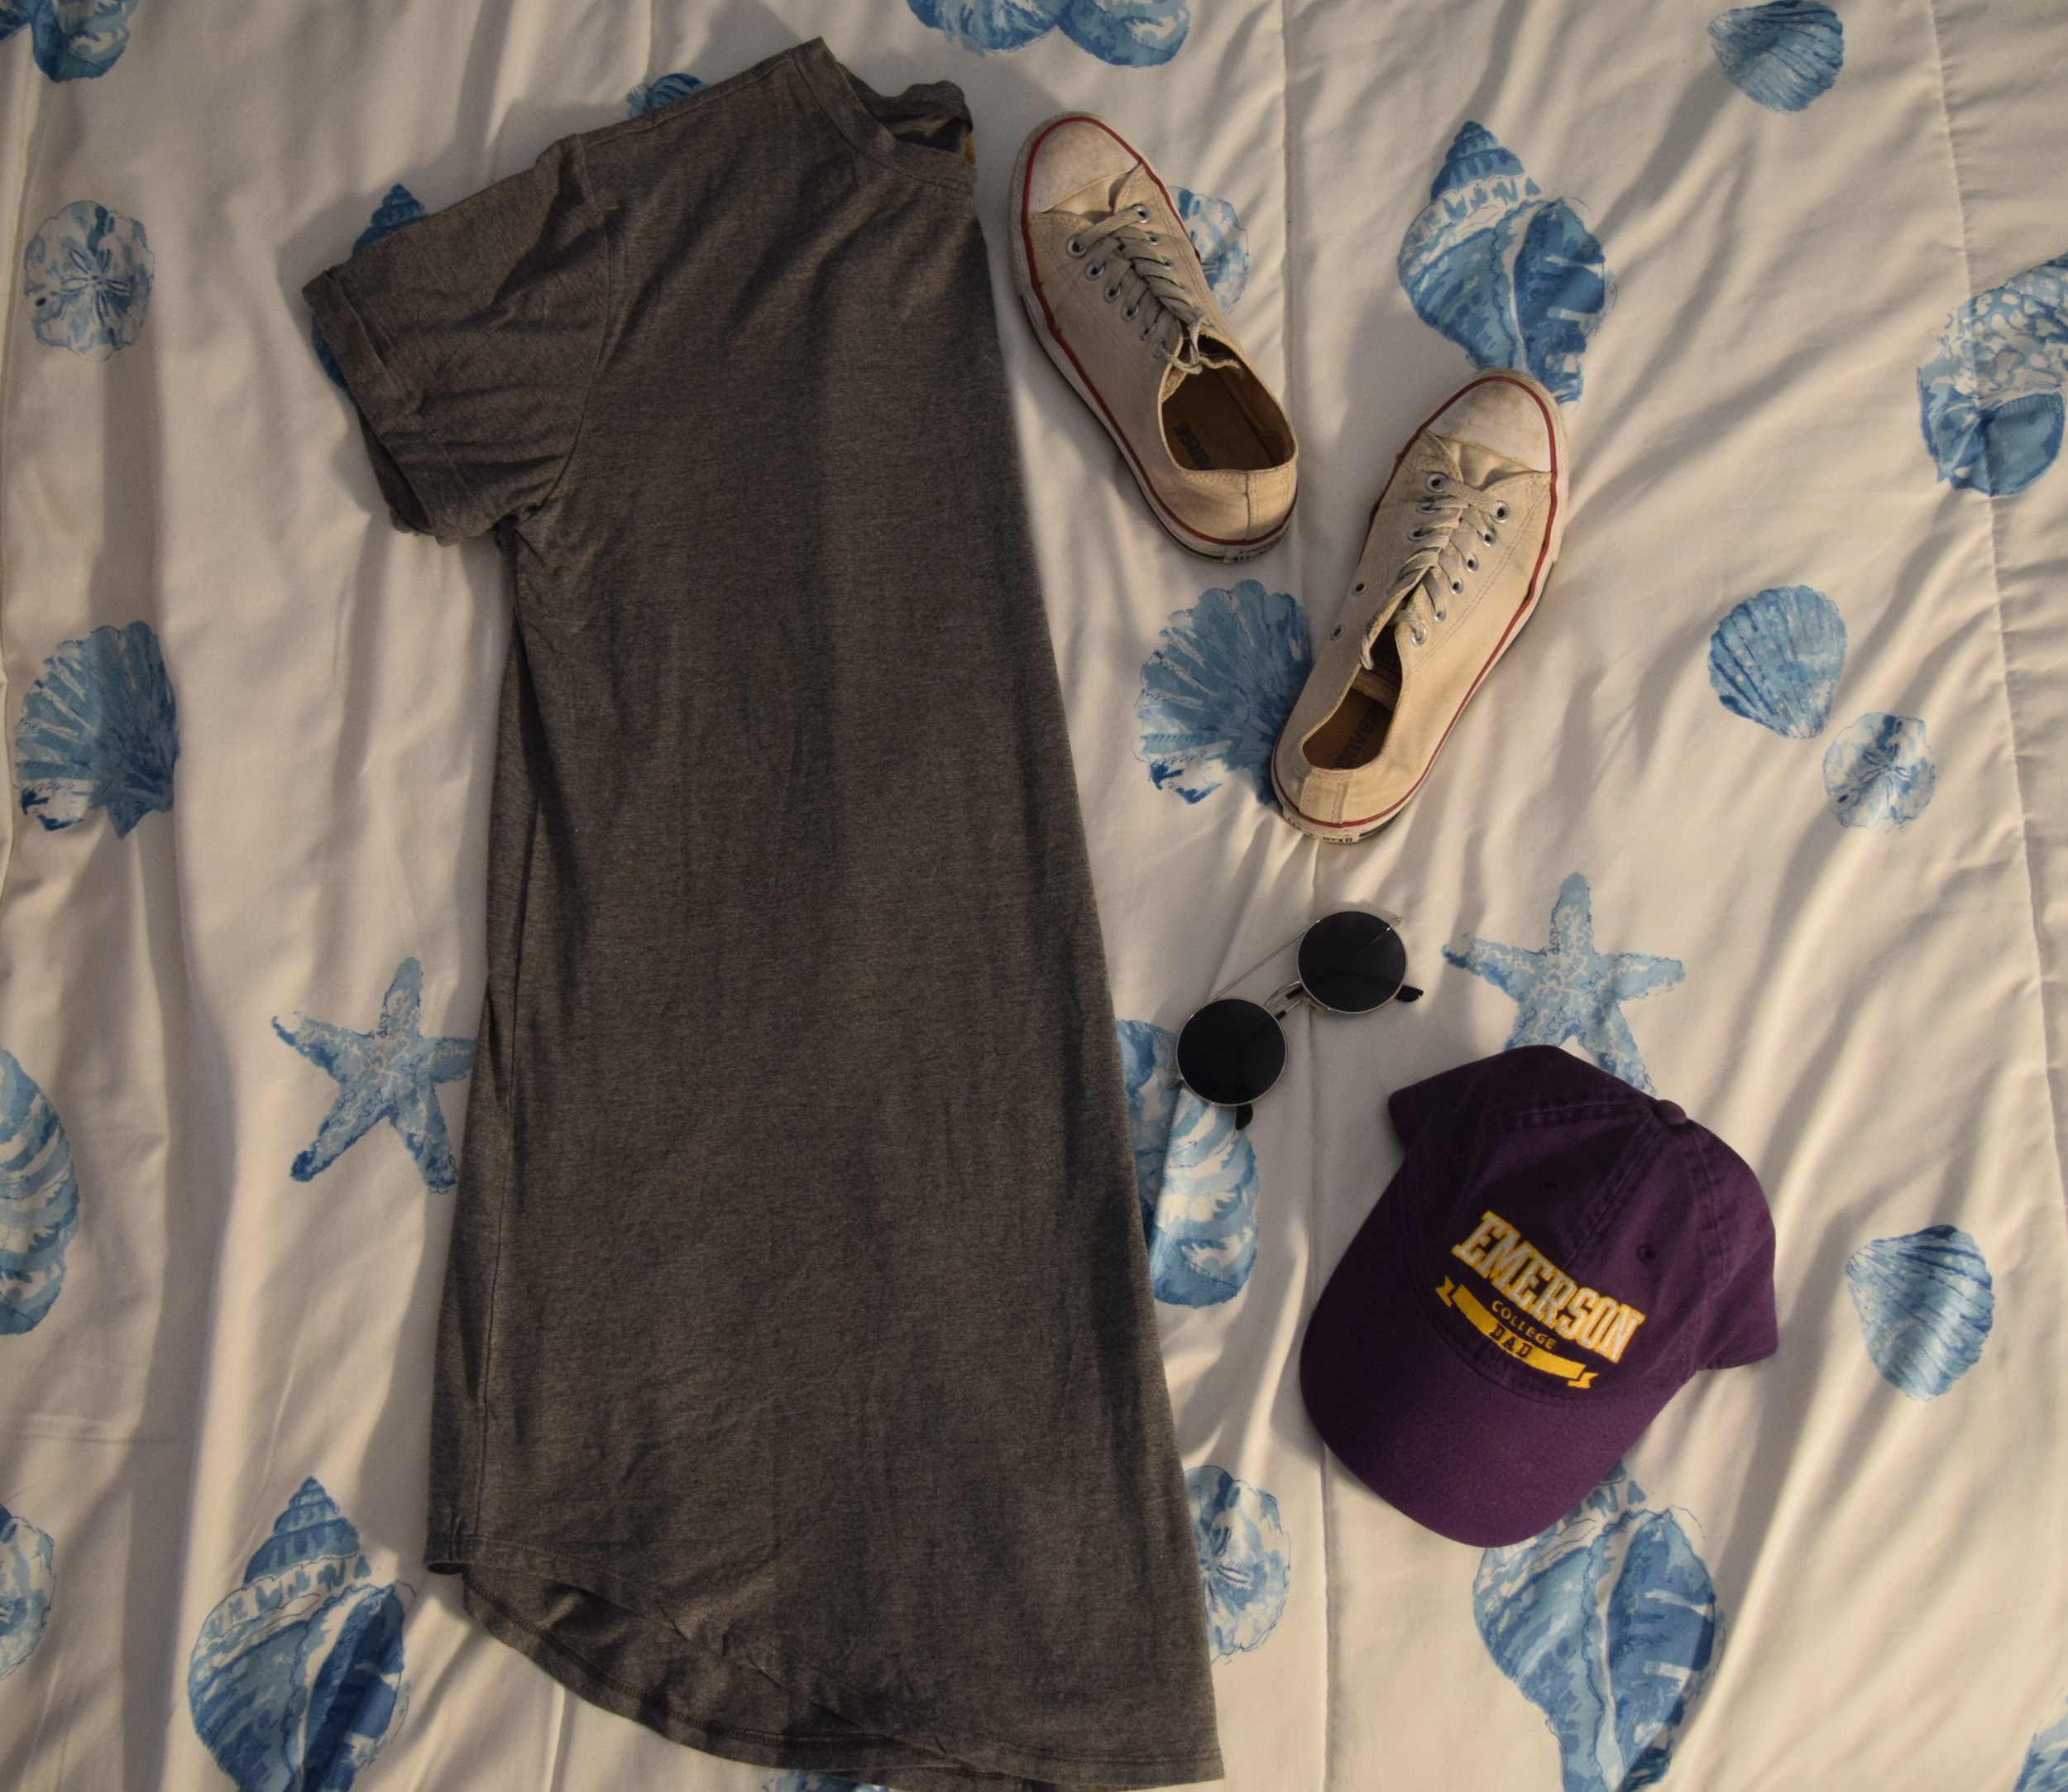 Dress .  Hat .  Sneakers .  Sunglasses  (similar).